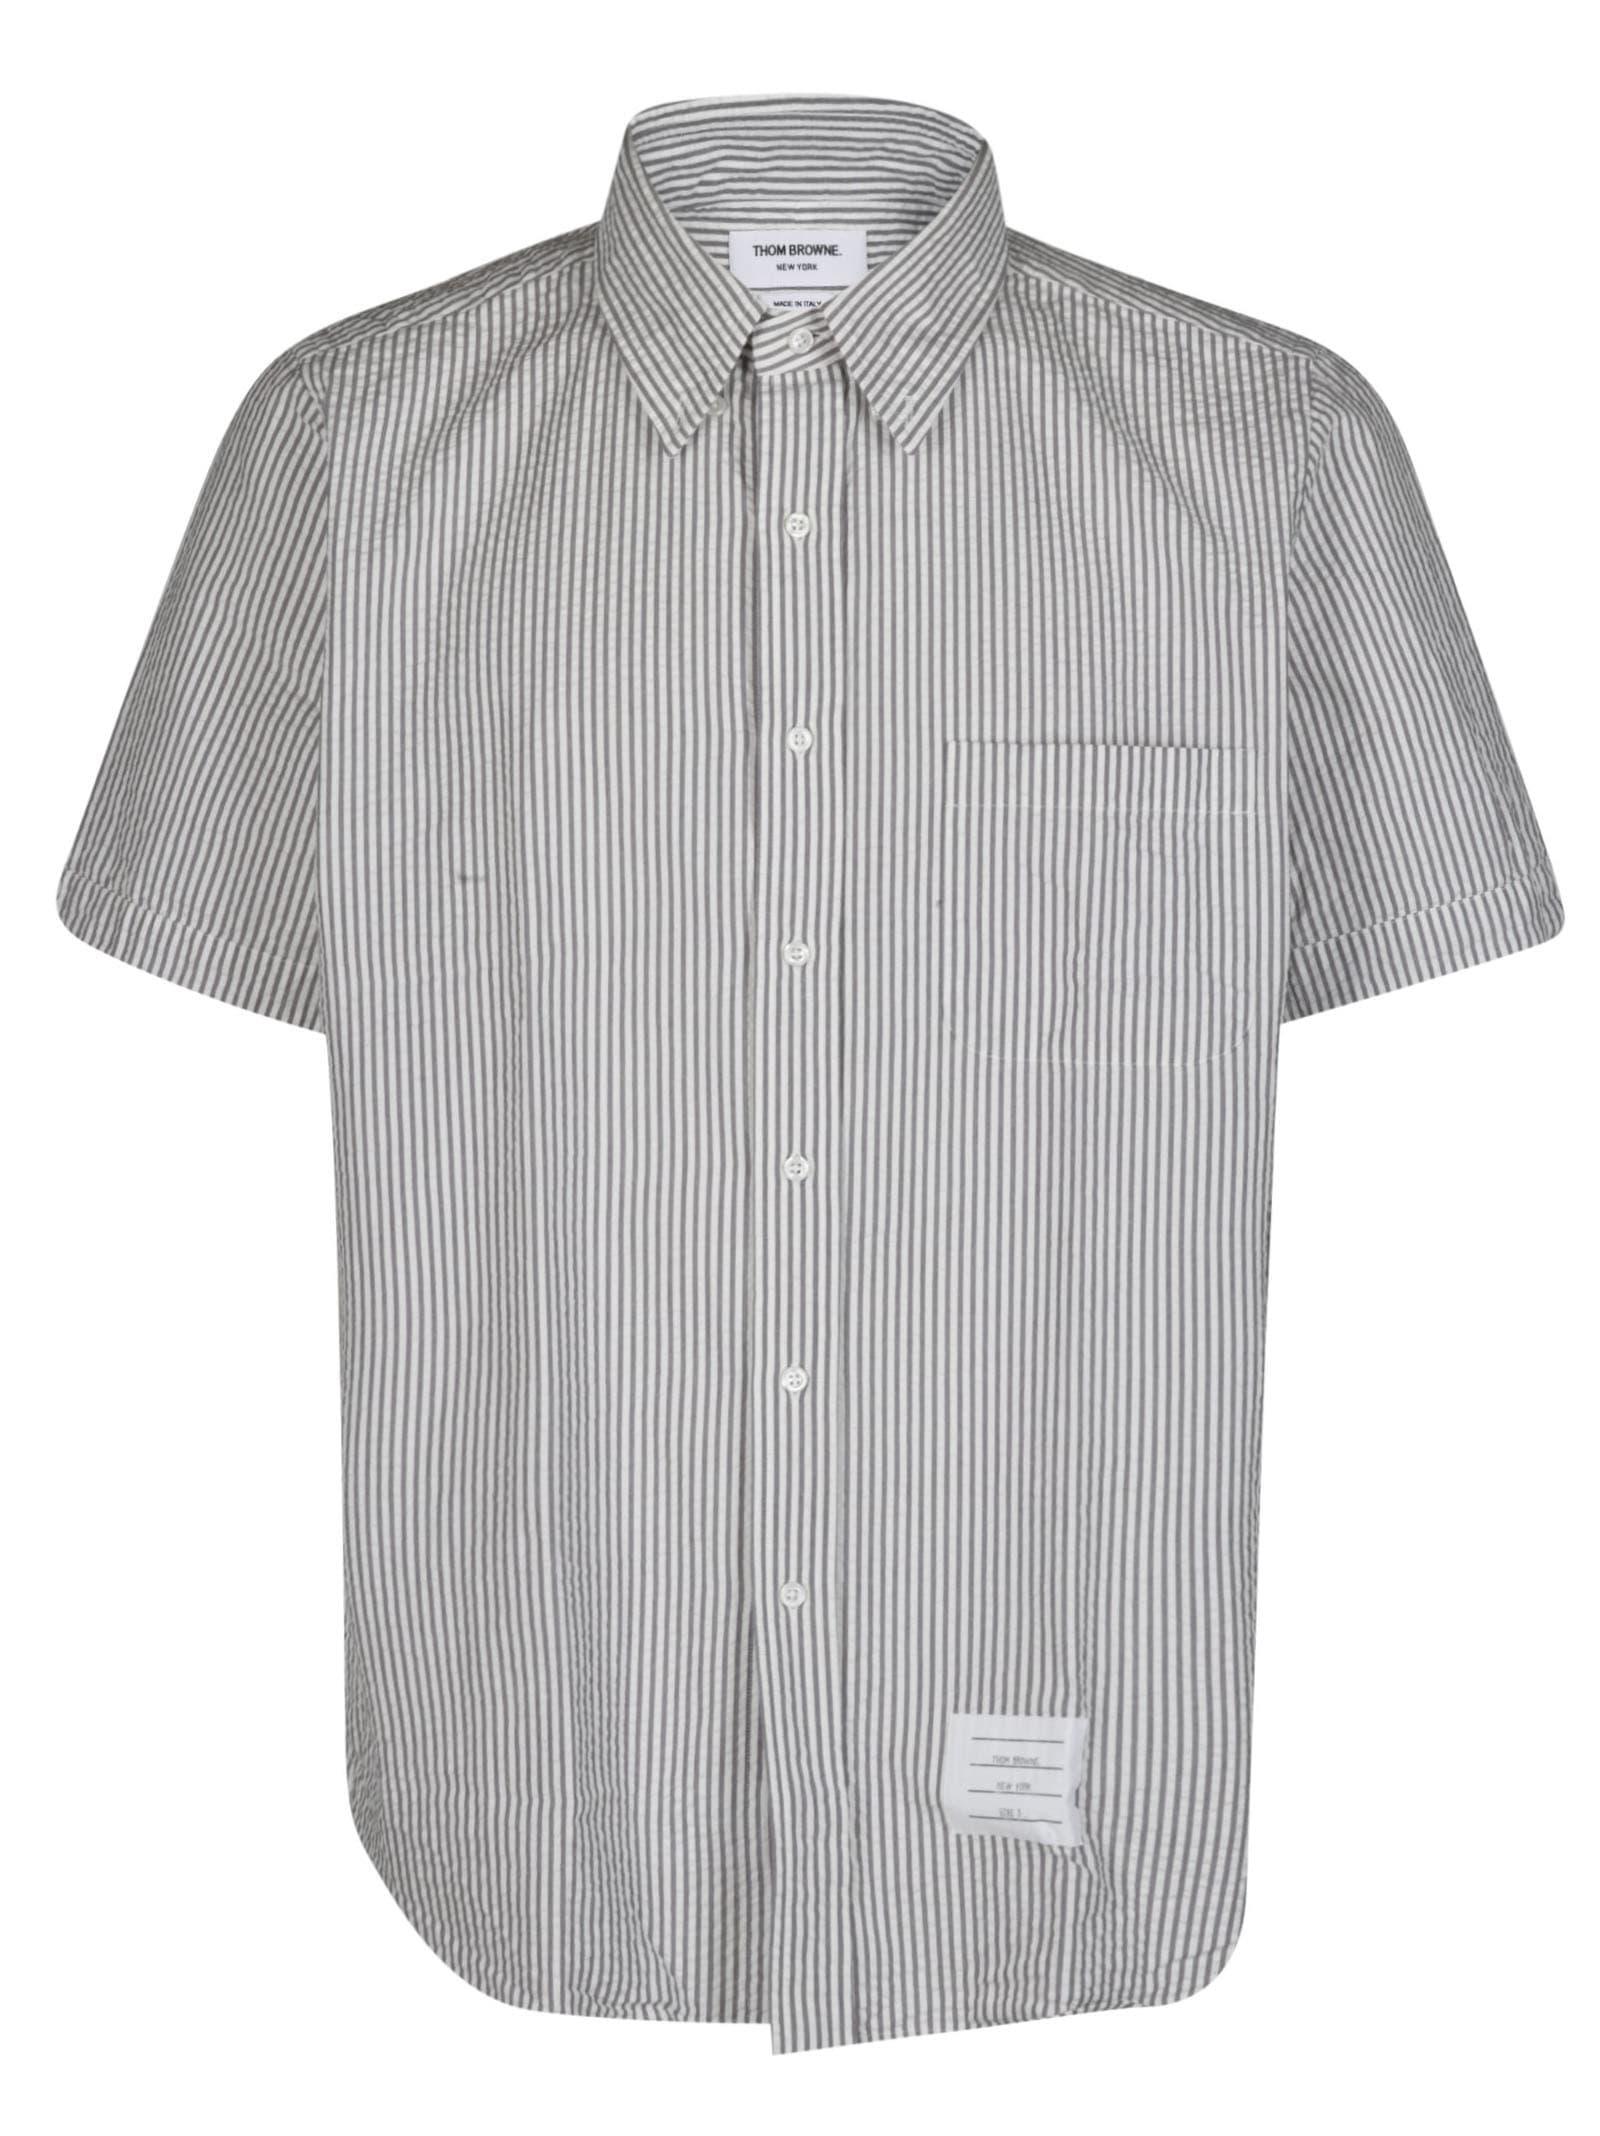 Thom Browne Grey Cotton Shirt